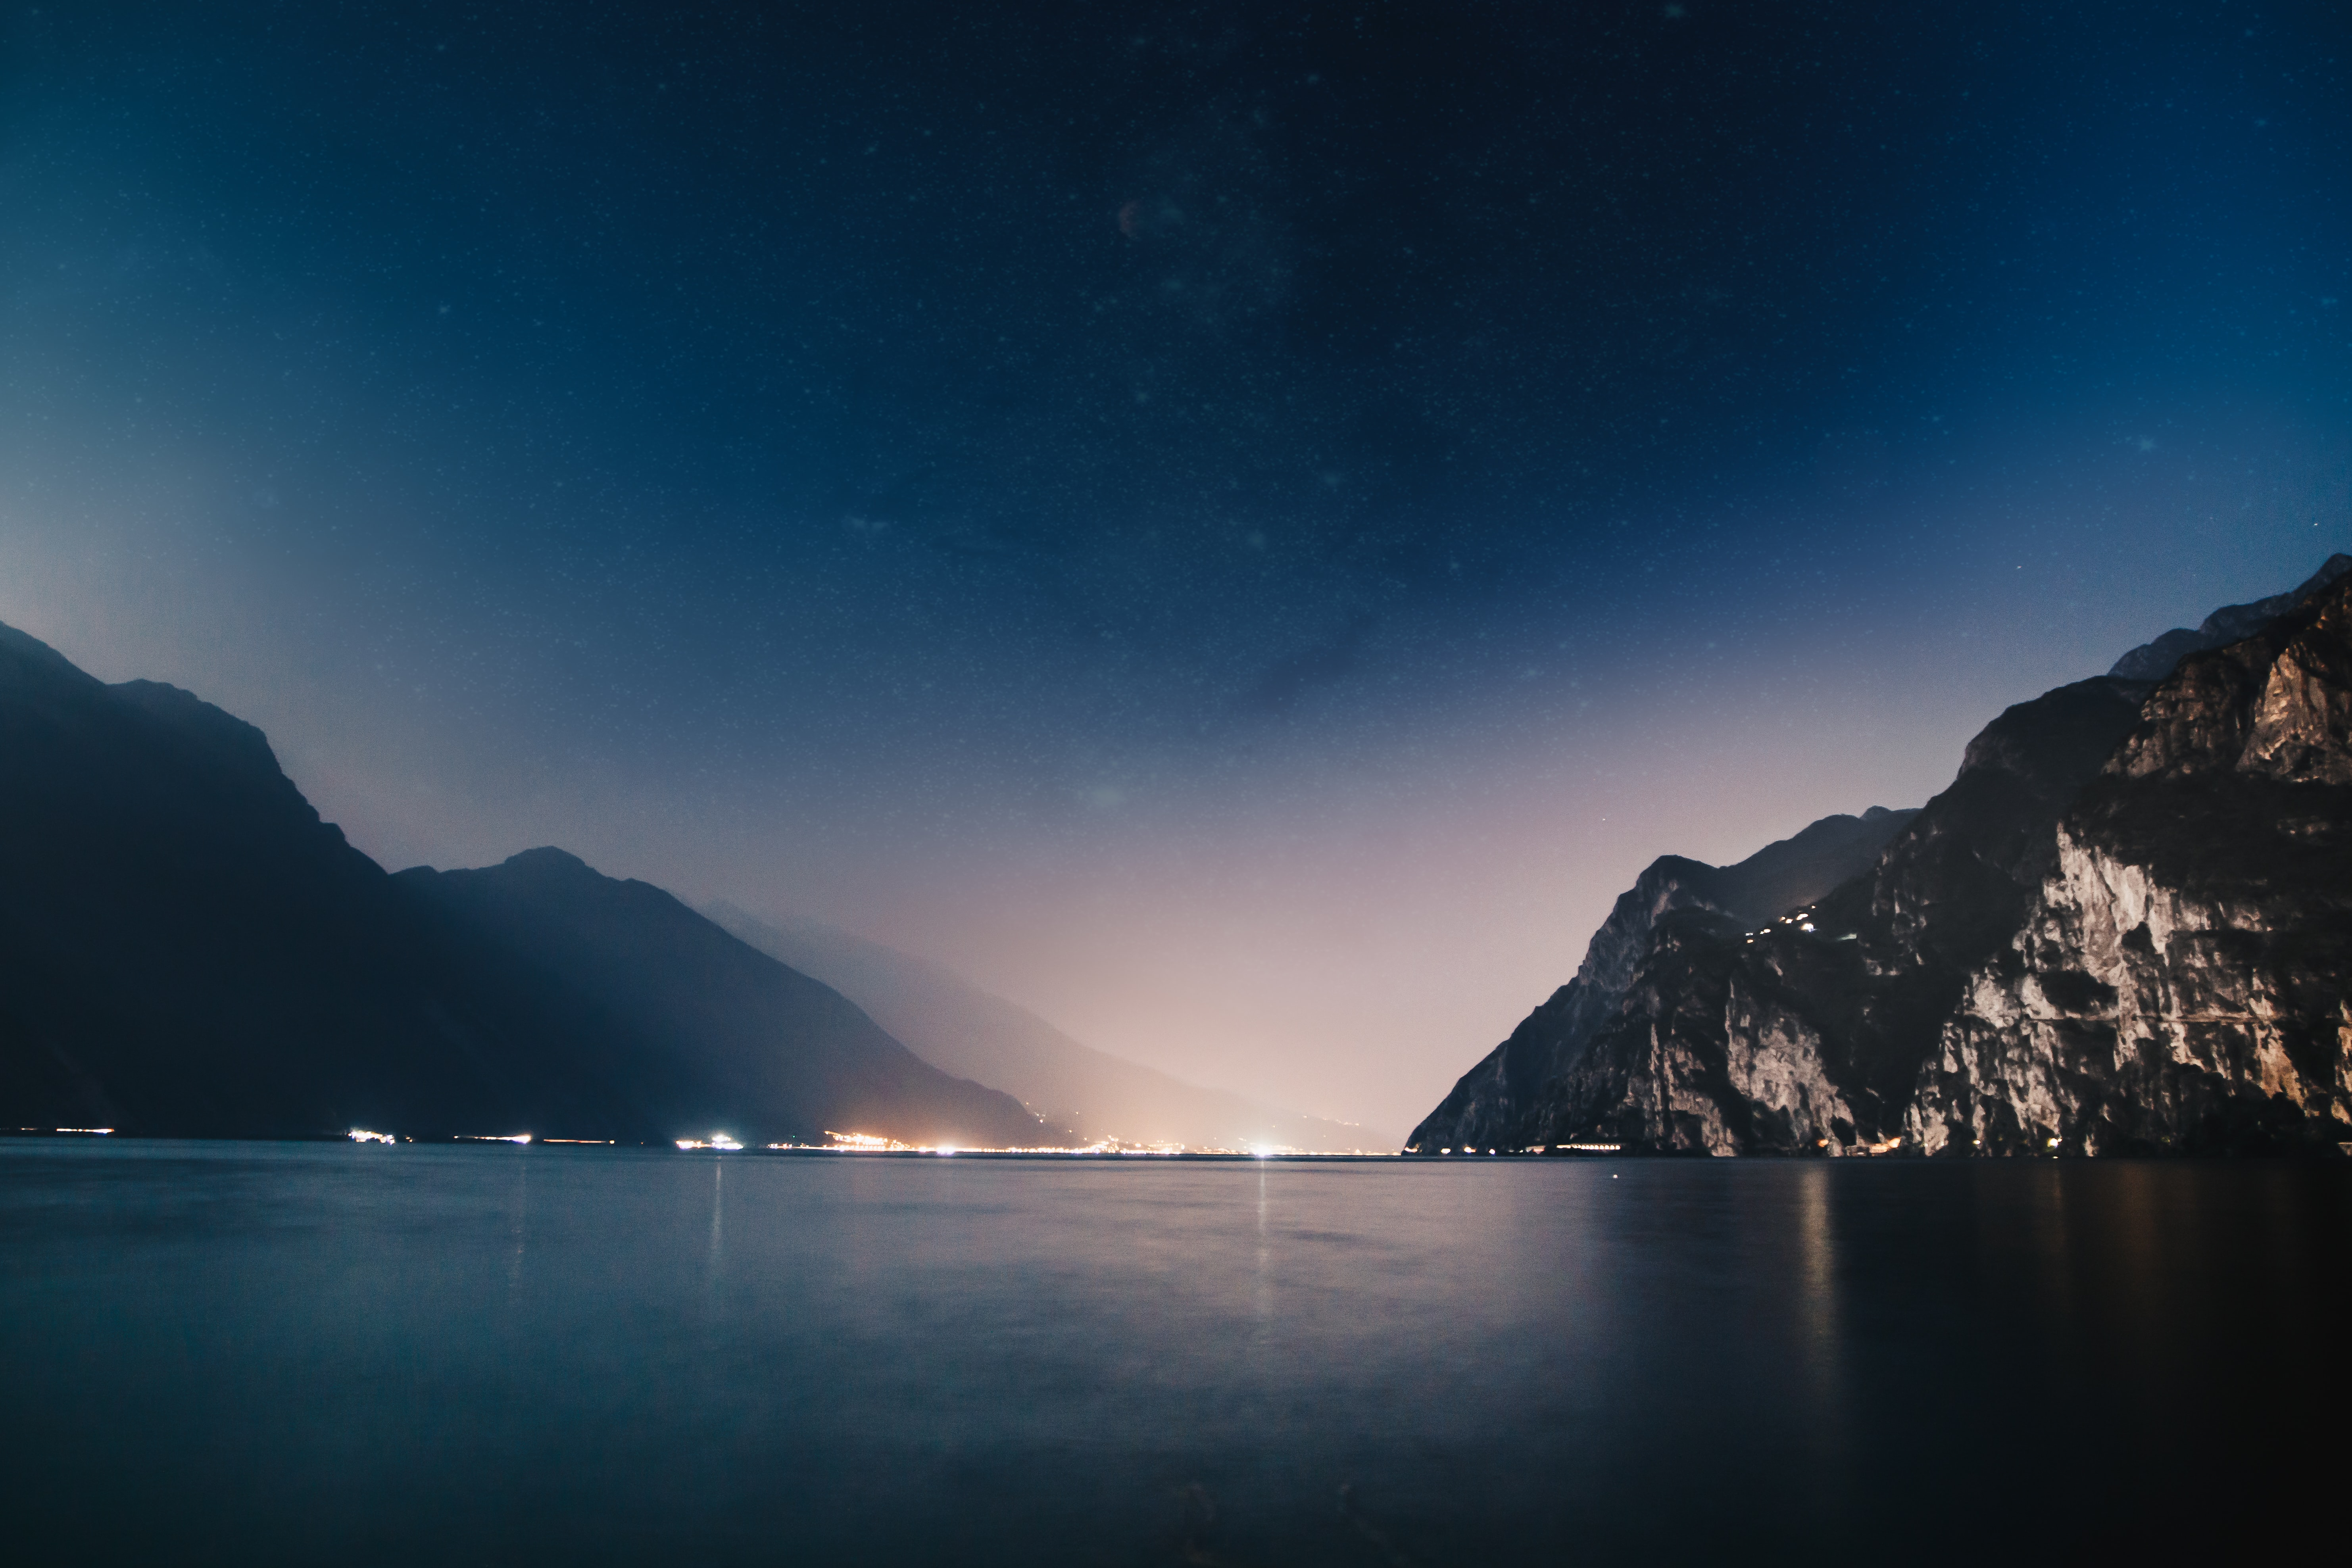 horizon scenery of mountain and sea during nighttime